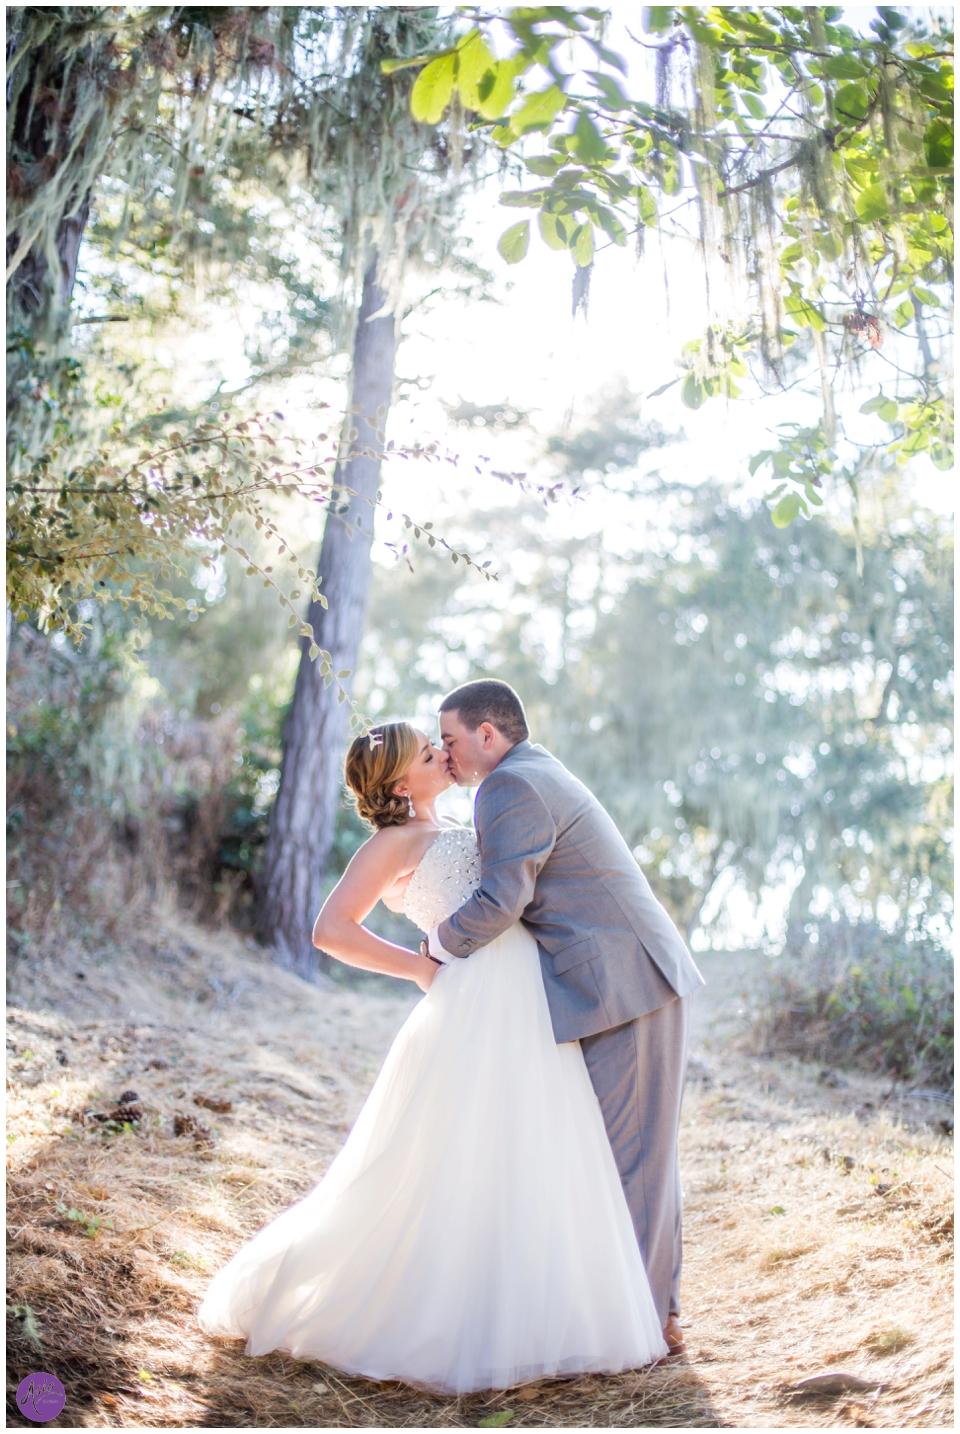 Wedding Photographer Asia Croson Photography San Luis Obispo-3395_Asia Croson Photography stomped.jpg